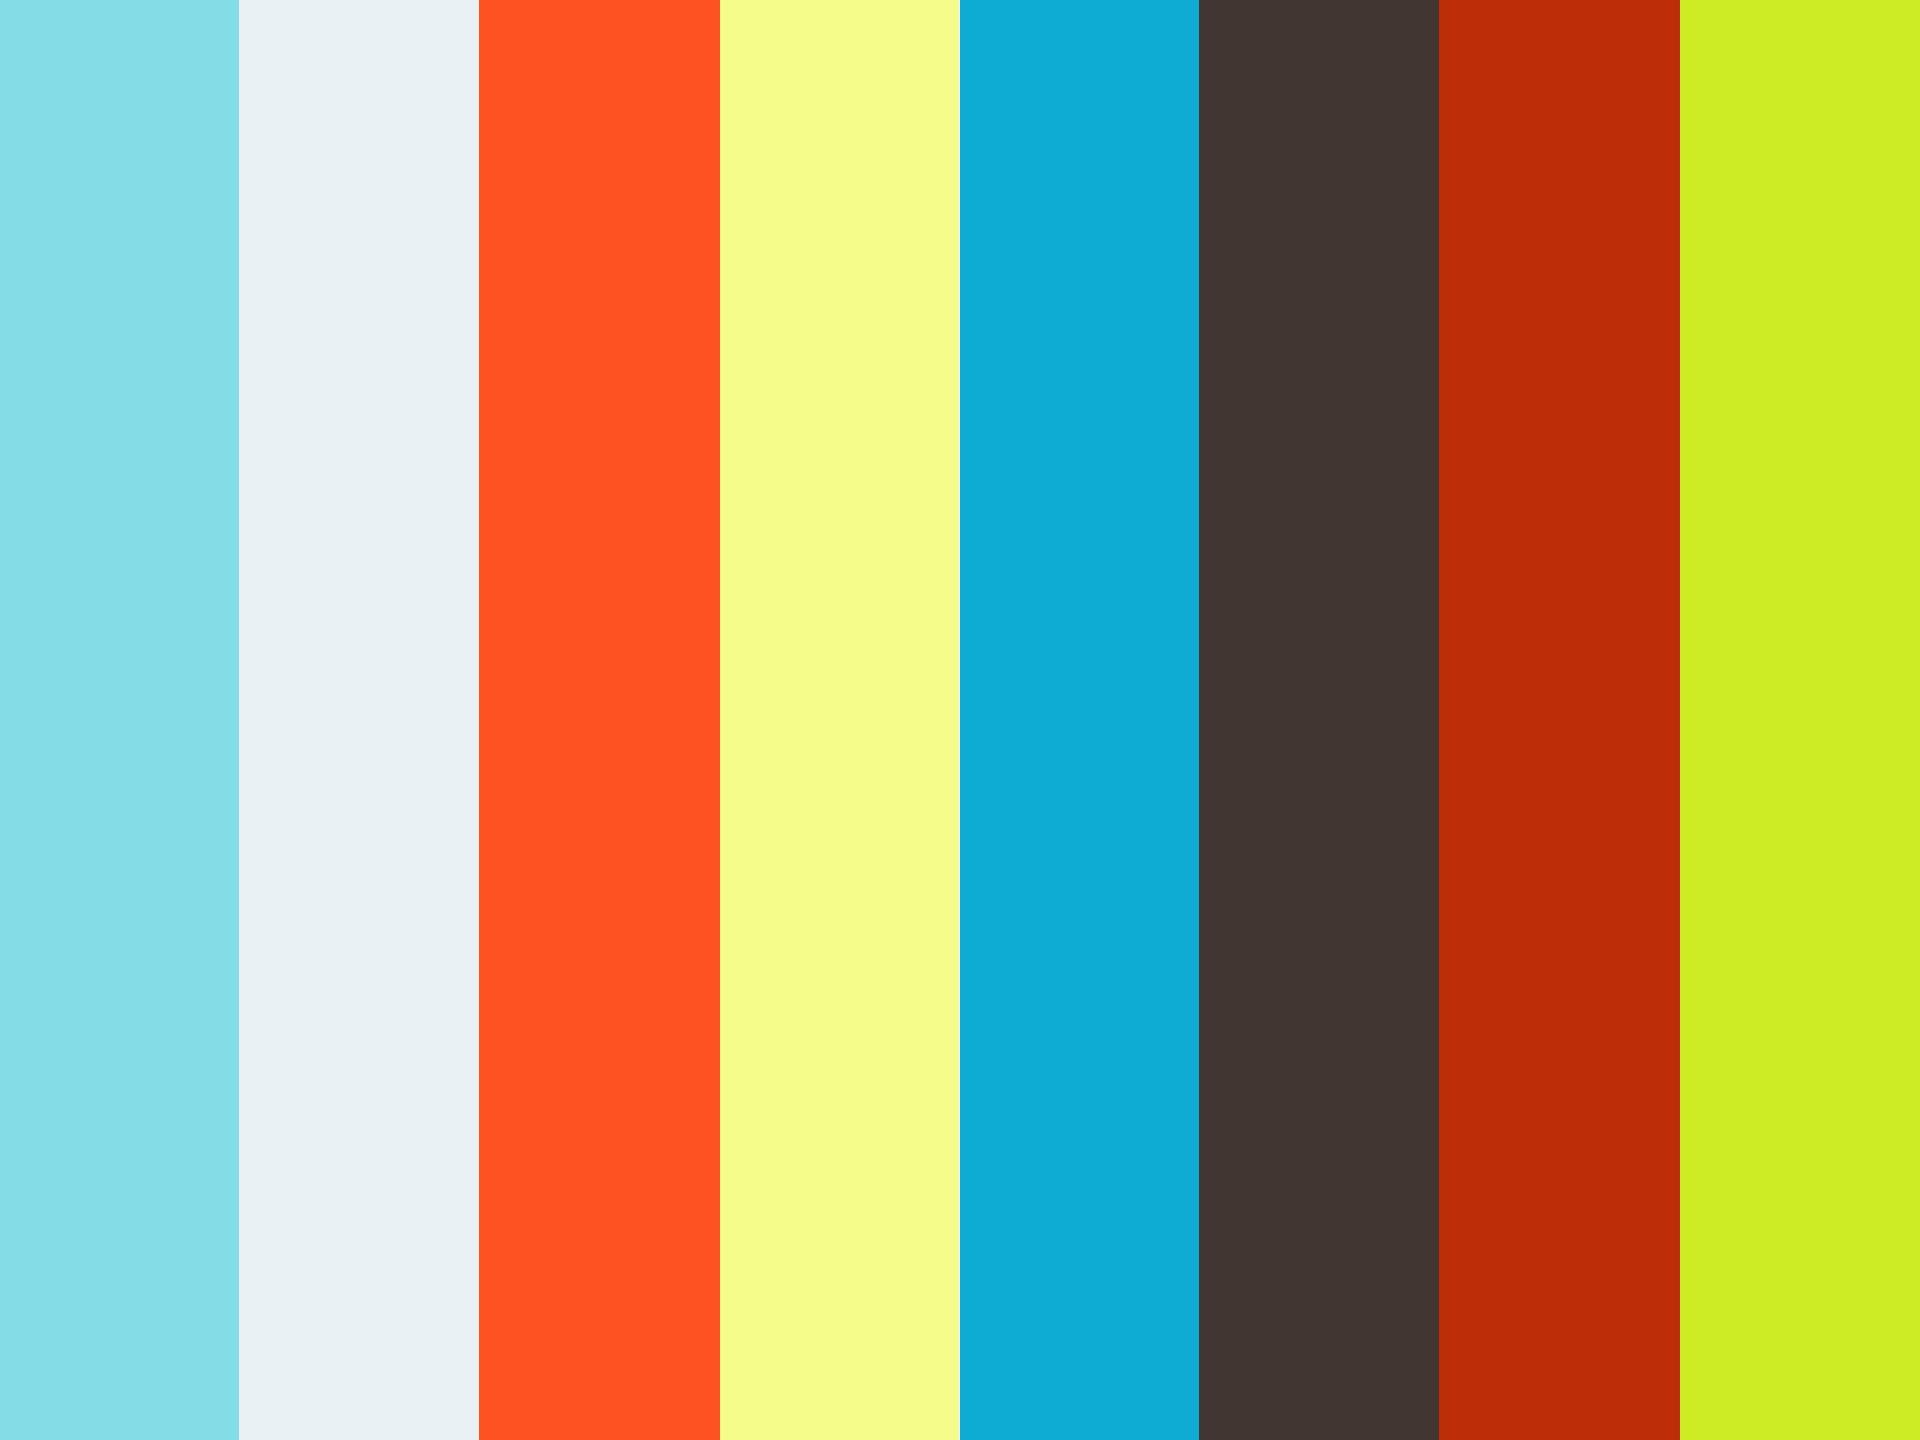 【special】内山徹哉先生:⑩クラウン修復の心臓であるプロビジョナルレストレーション 〜その役割と補綴前処置の必要性 印象採得法まで〜 #2